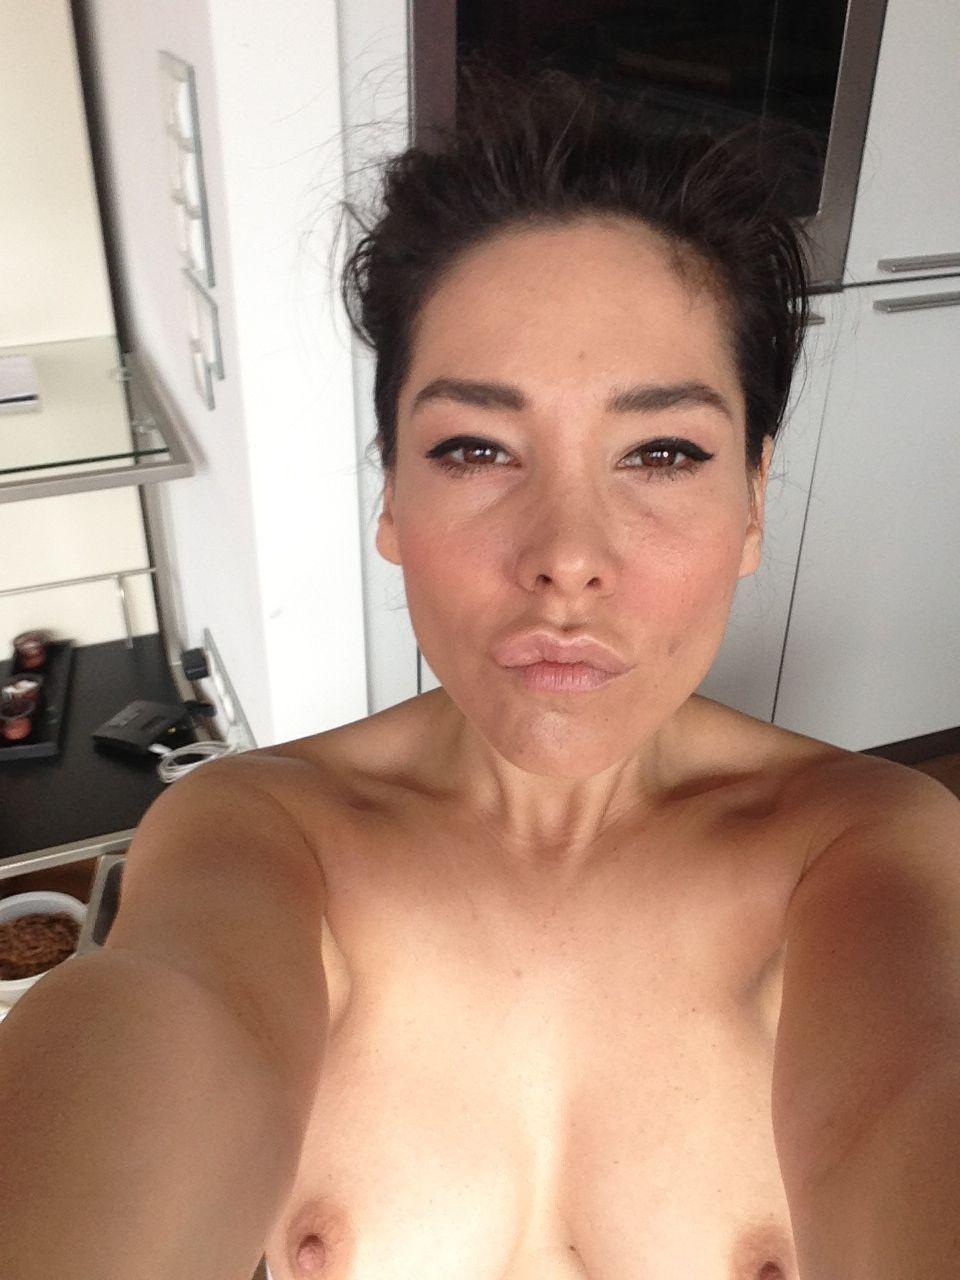 Instagram XXX Sandra Ahrabian naked photo 2017